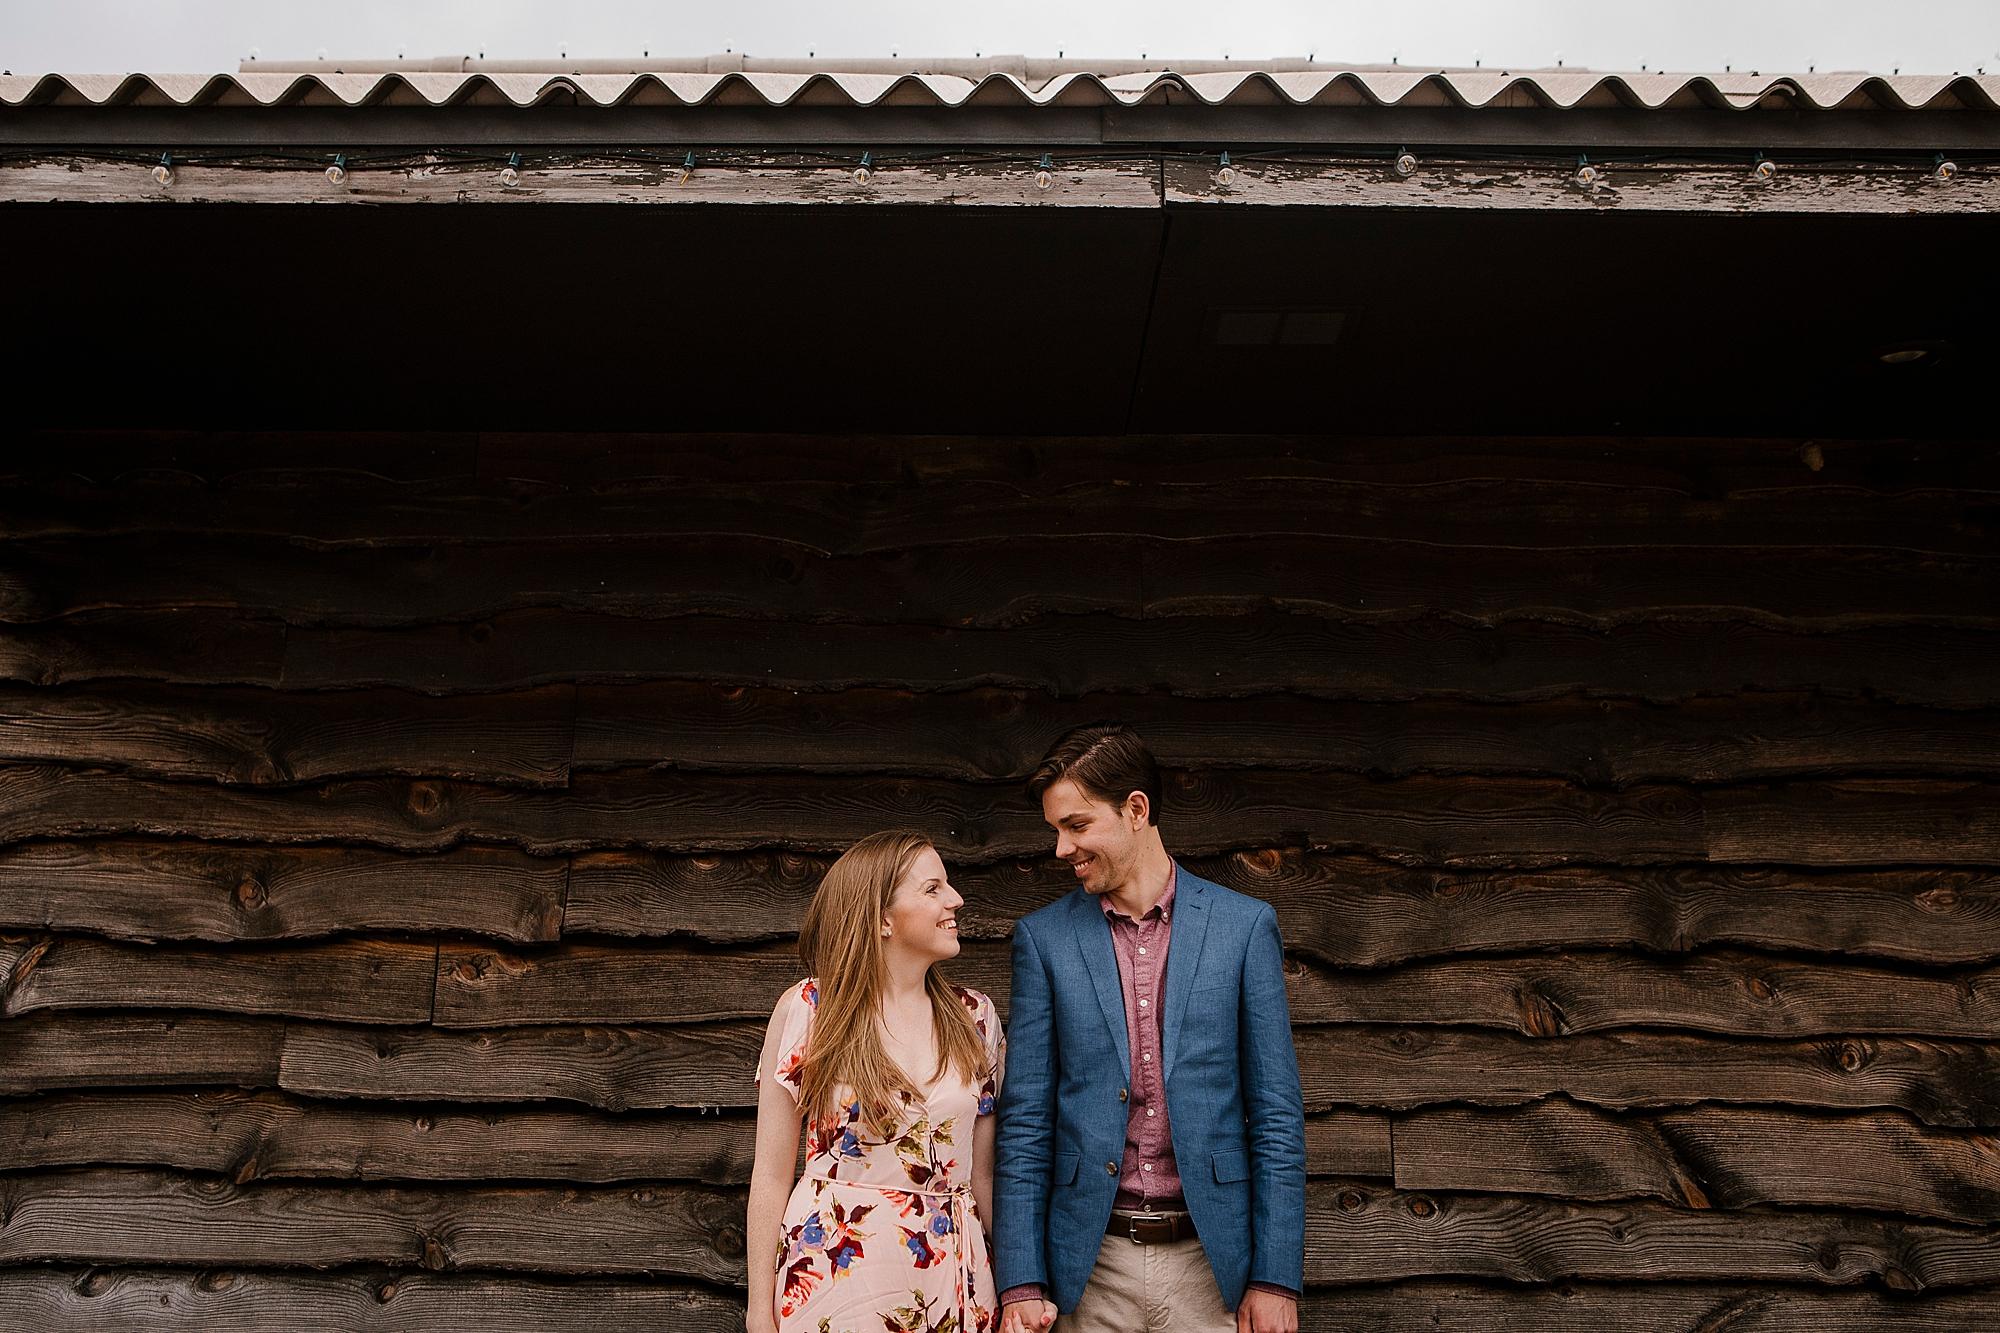 Tori_Zack_Glen_Mills_Terrain Cafe_Wedding_Engagement_Photography_Joe_Mac_Creative__0002.jpg